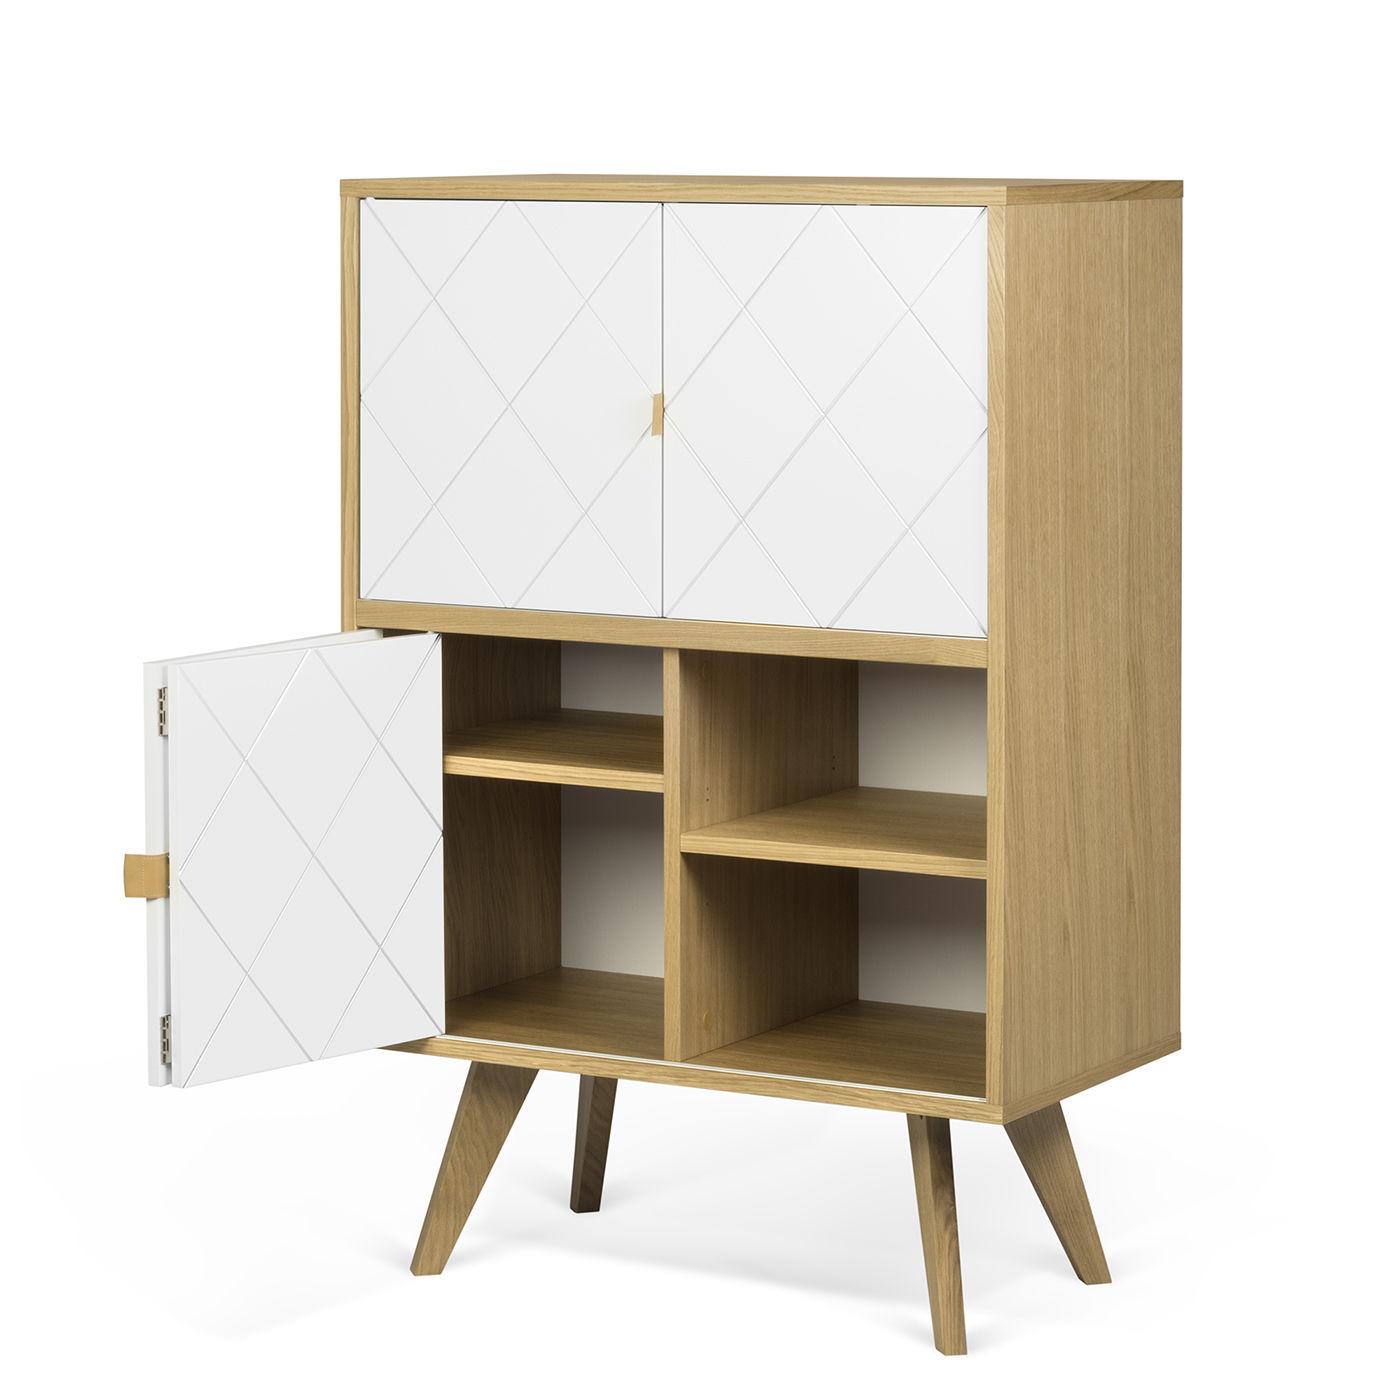 butterfly hoch l 80 cm x h 125 cm pop up home anrichte. Black Bedroom Furniture Sets. Home Design Ideas